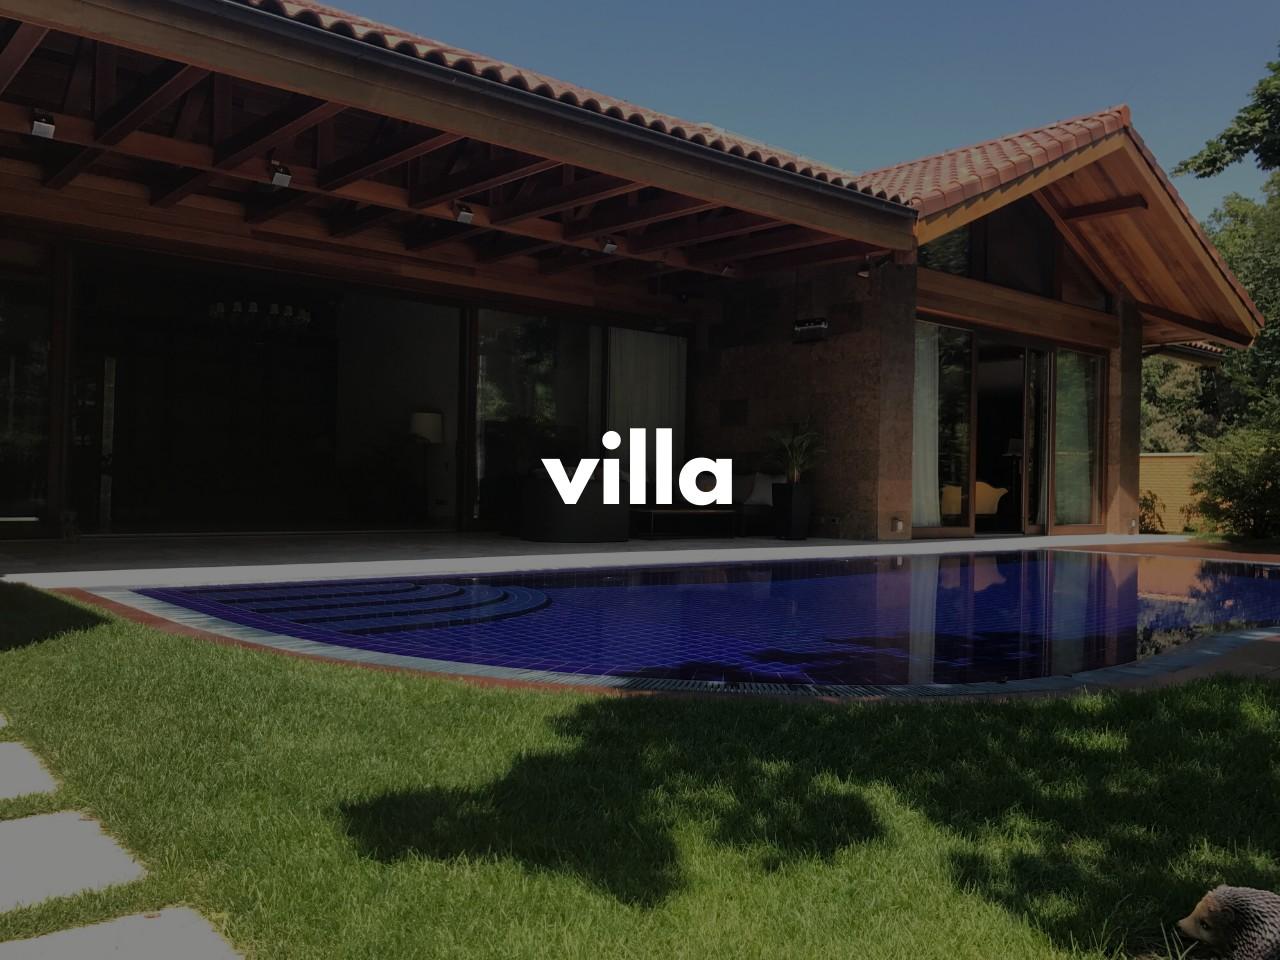 villa : 貸別荘